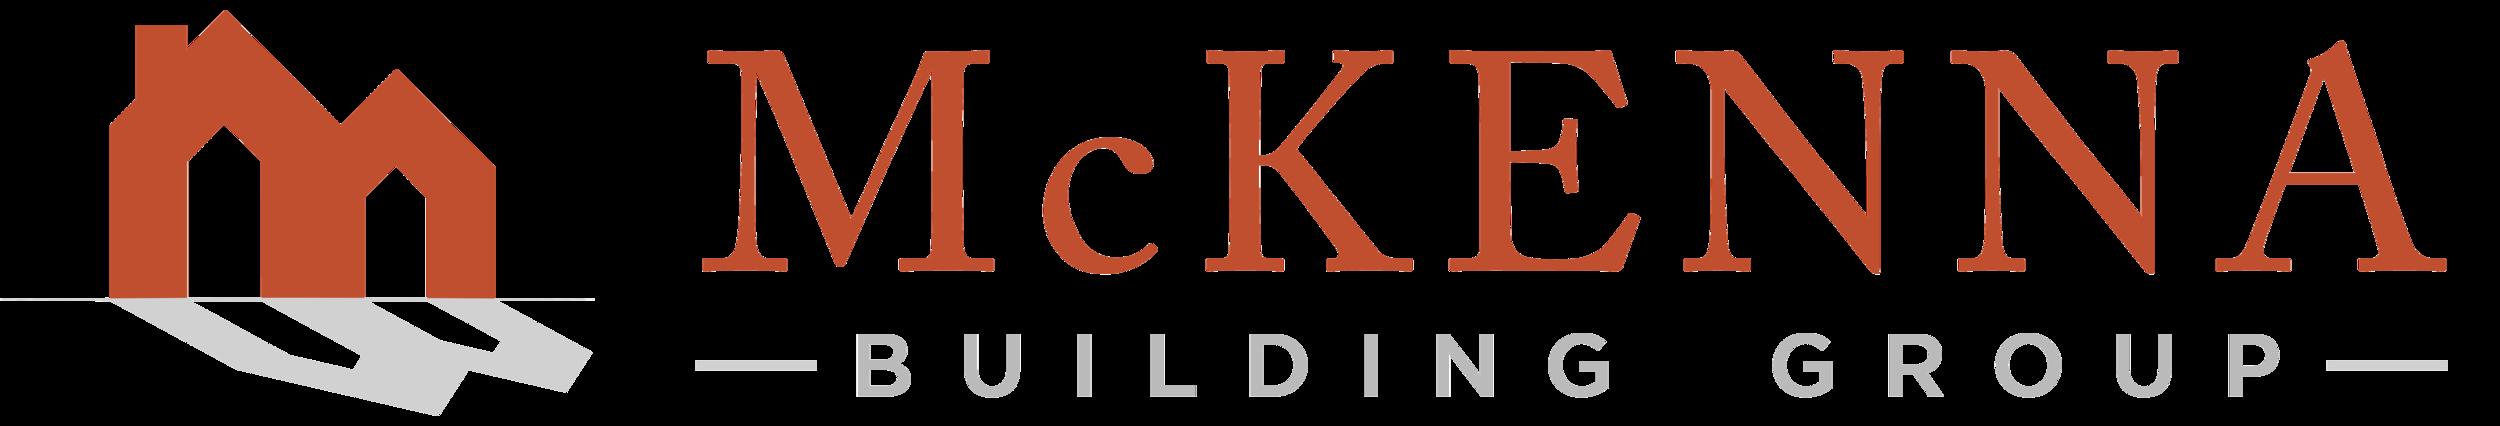 mckenna_Logo_3.png